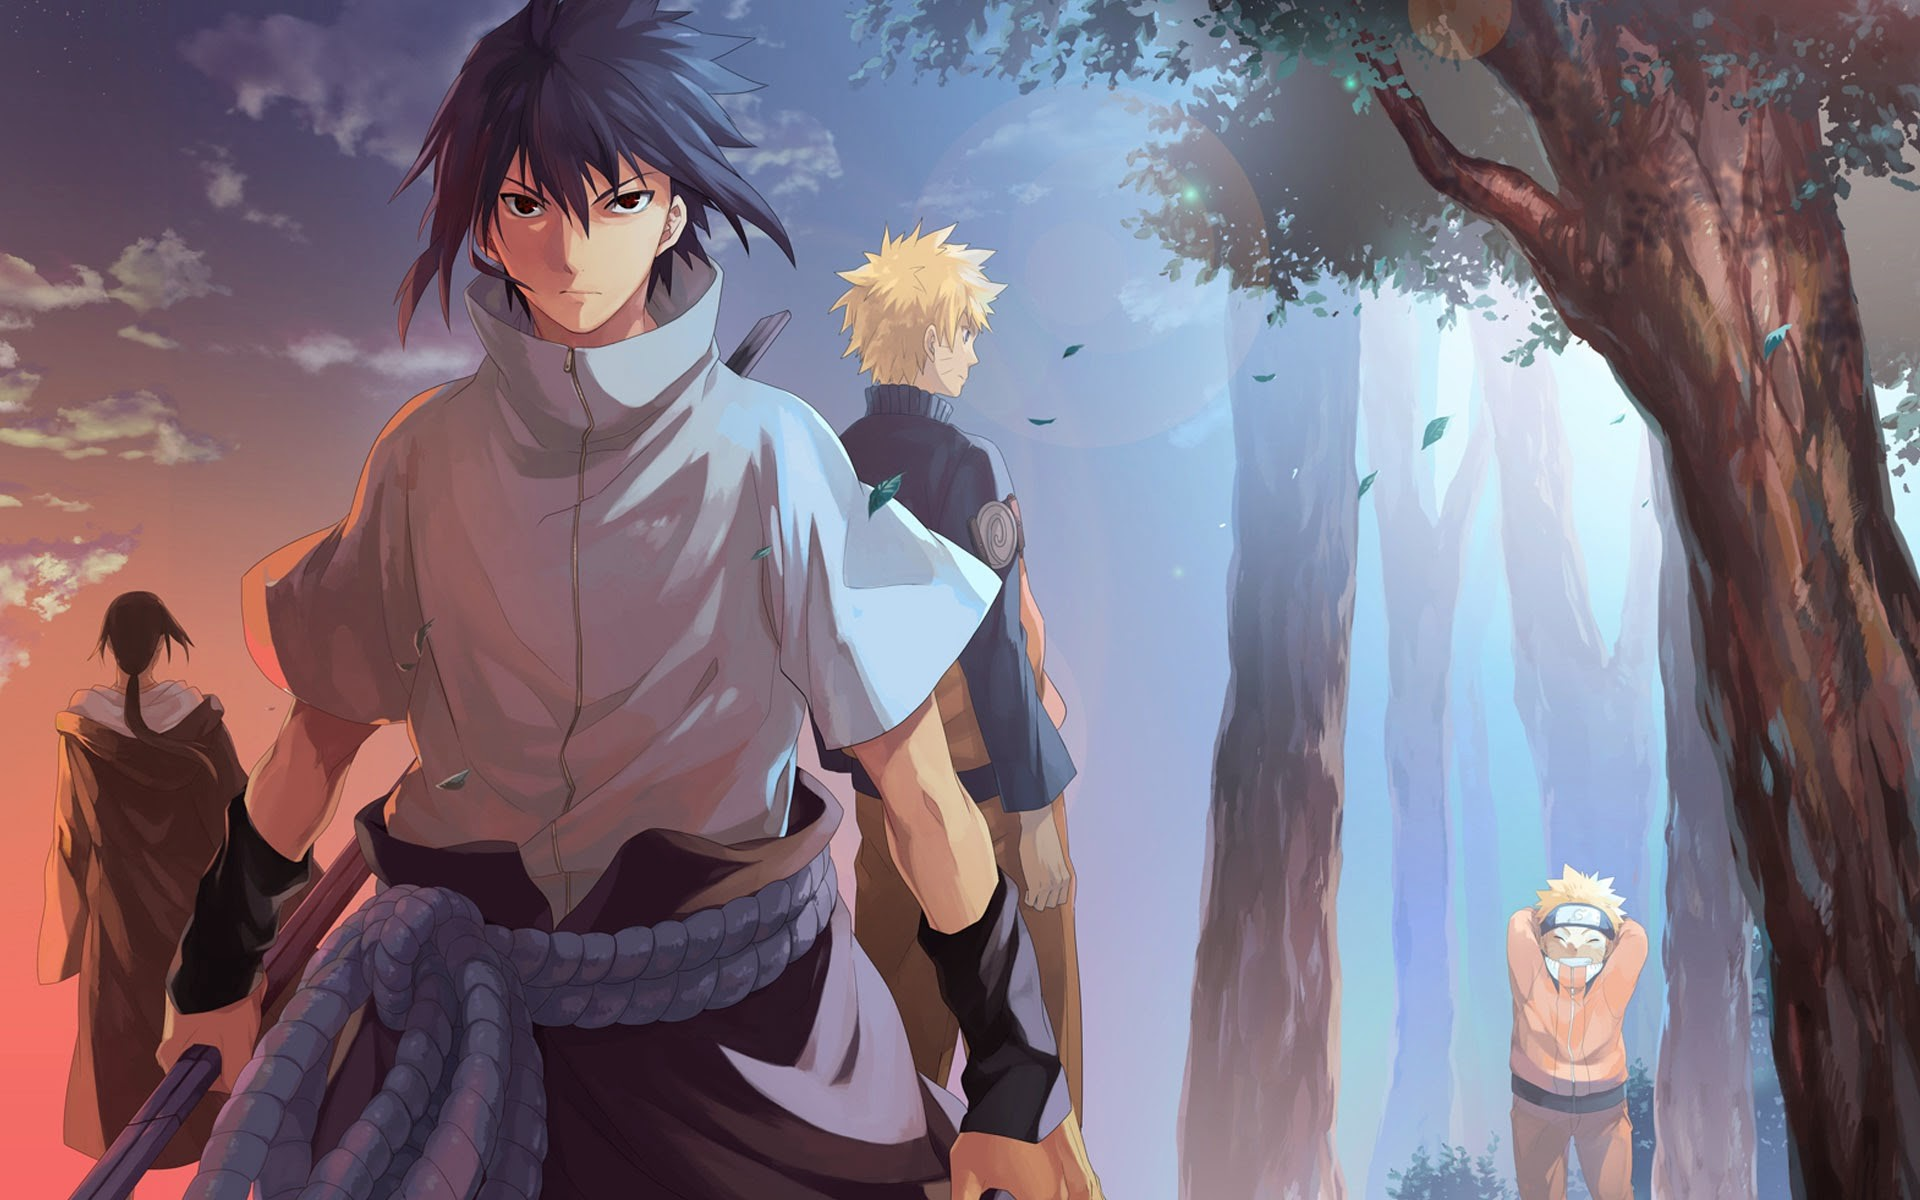 sasuke itachi uchiha brothers naruto anime hd wallpaper 7r.